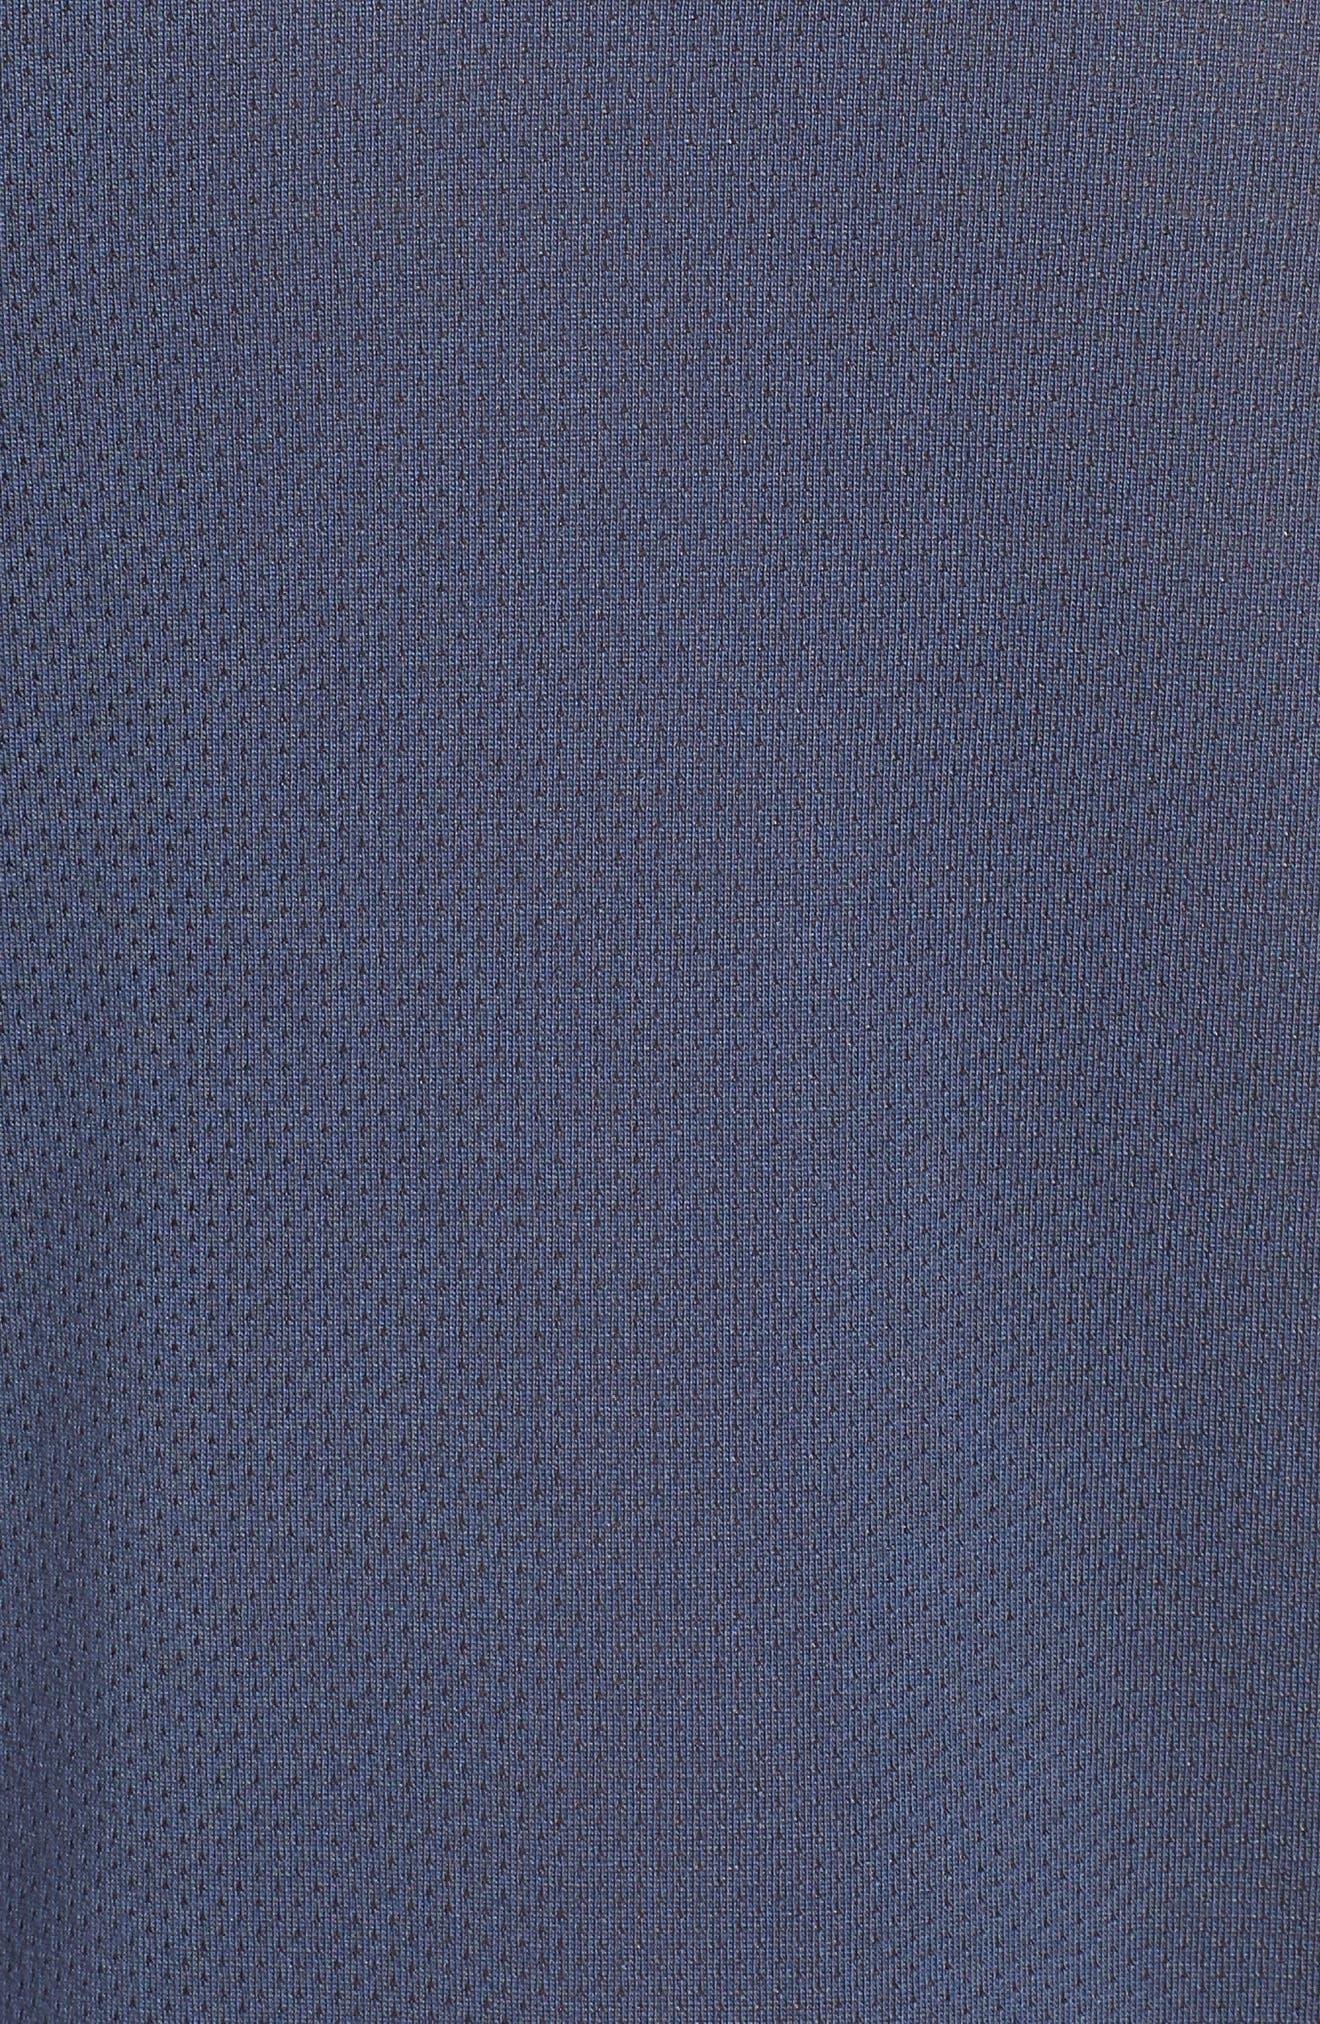 Tailwind Running T-Shirt,                             Alternate thumbnail 5, color,                             Thunder Blue